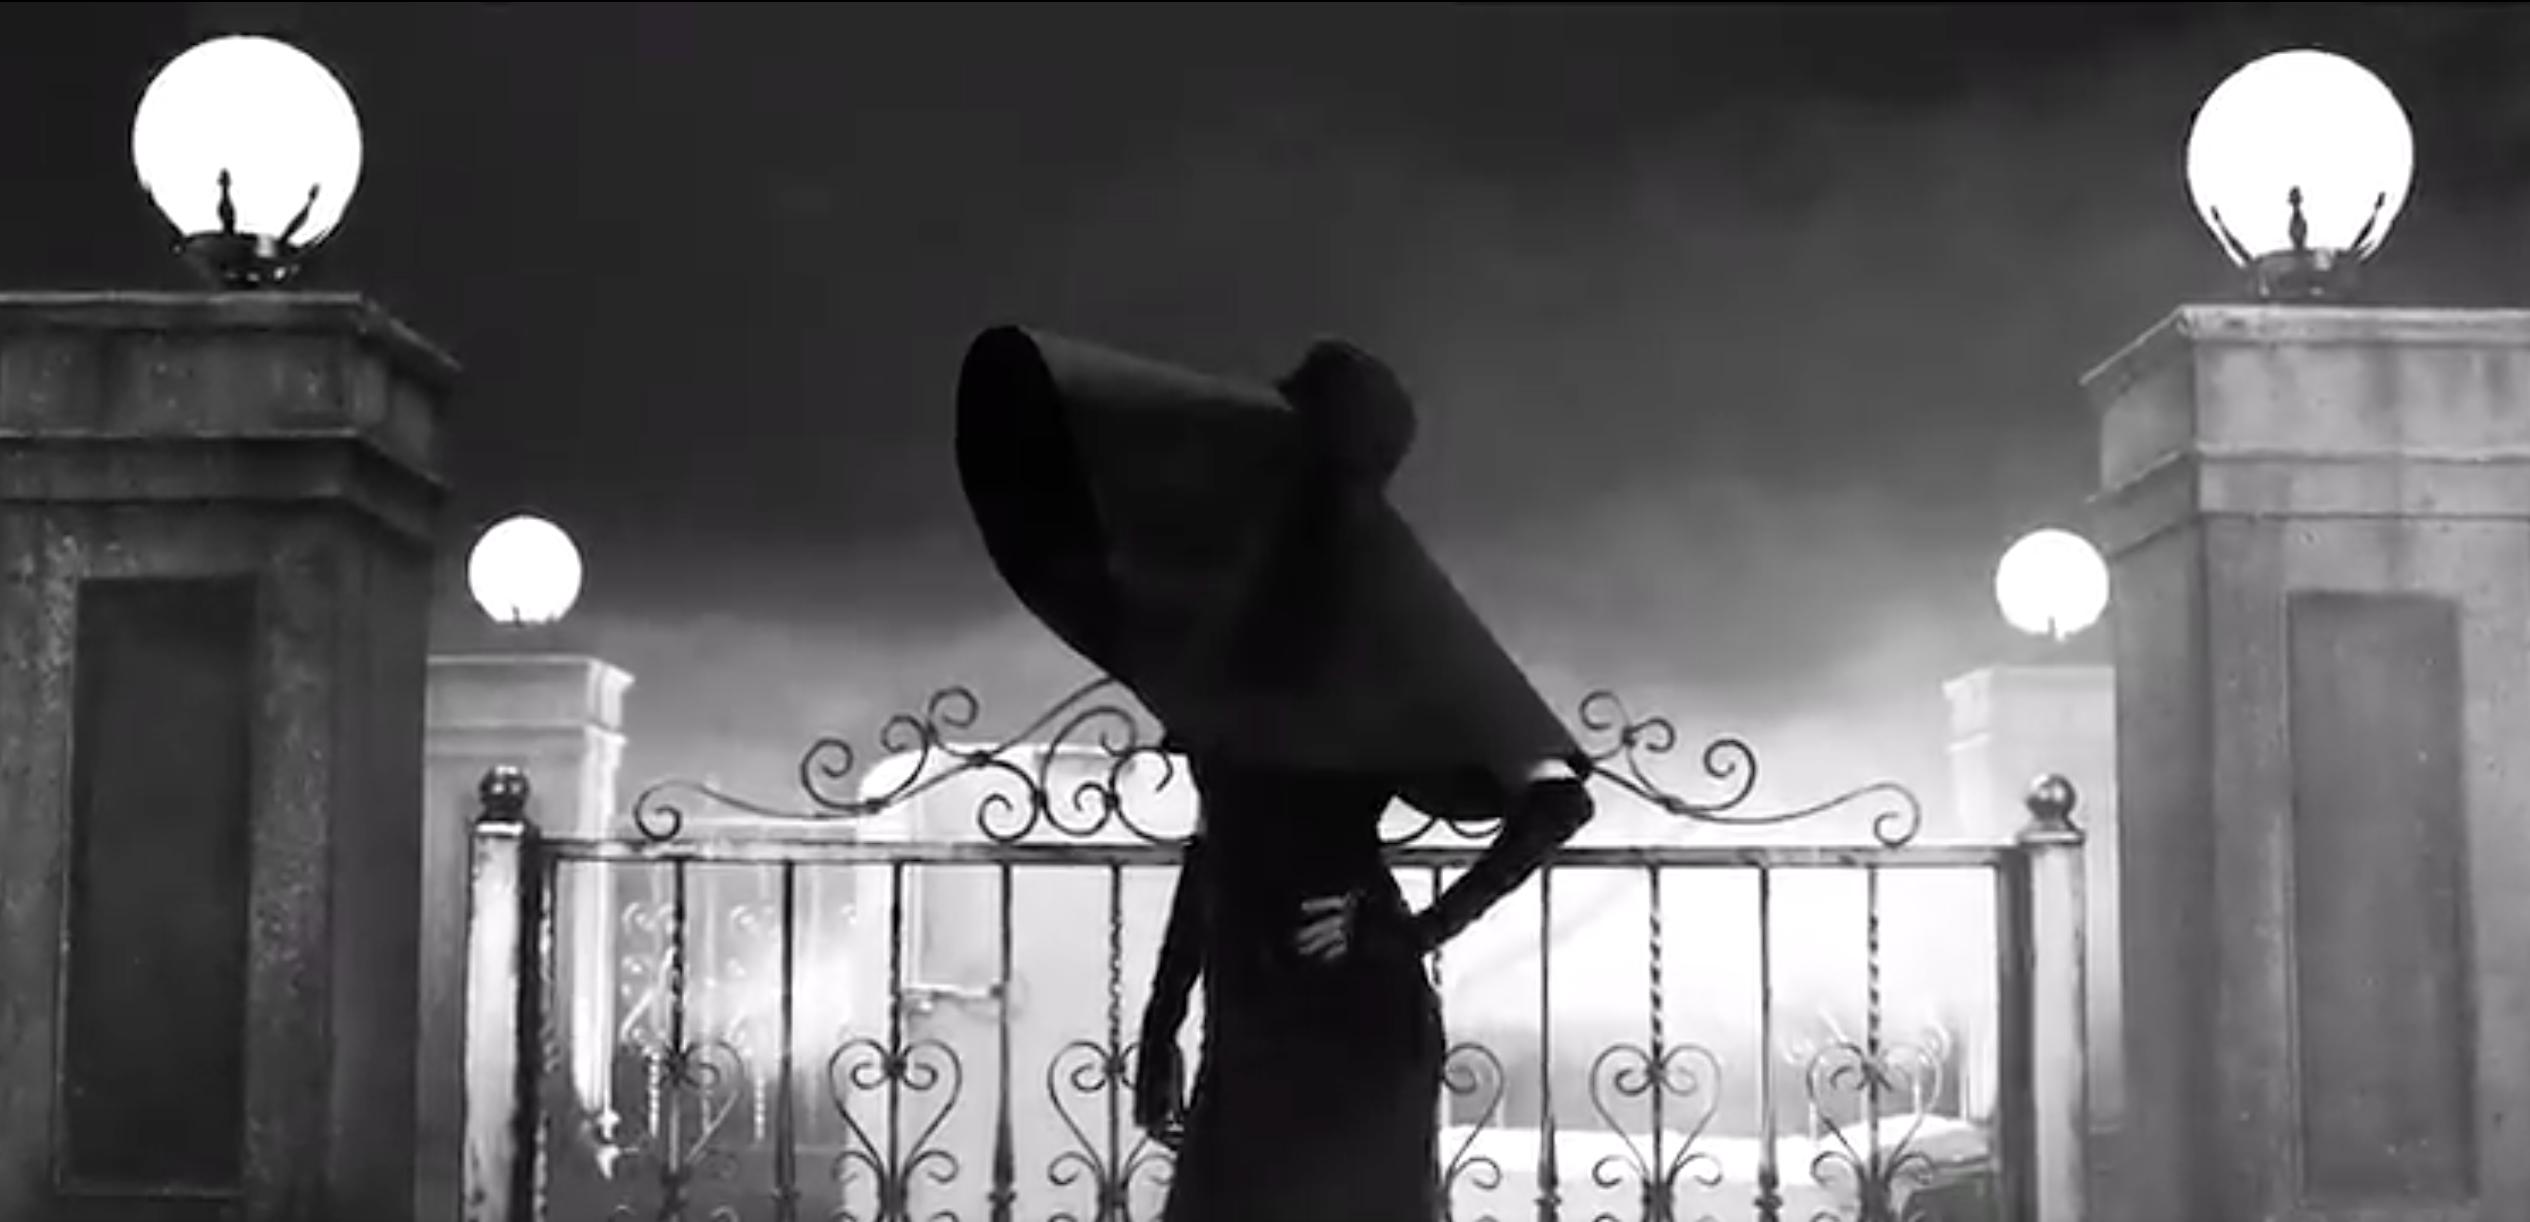 Watch: Girls' Generation's Seohyun Is A Glamorous Black Widow In Solo MV Teaser